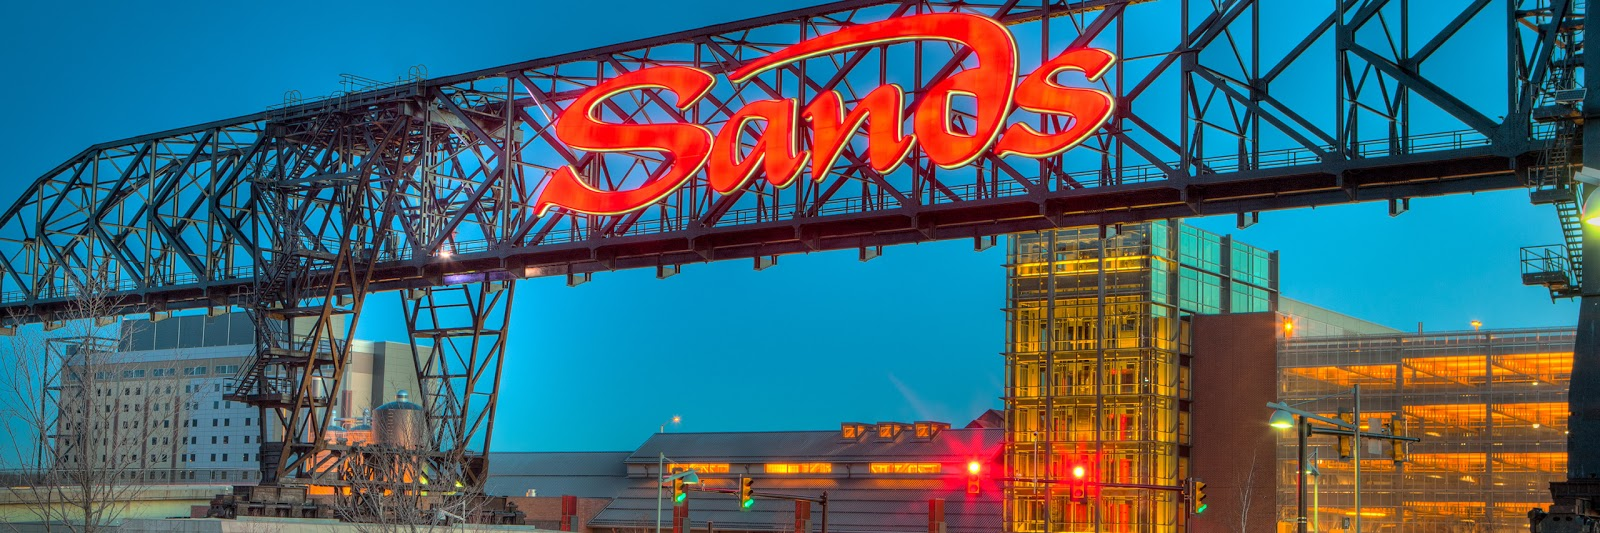 Sands casino in poconos